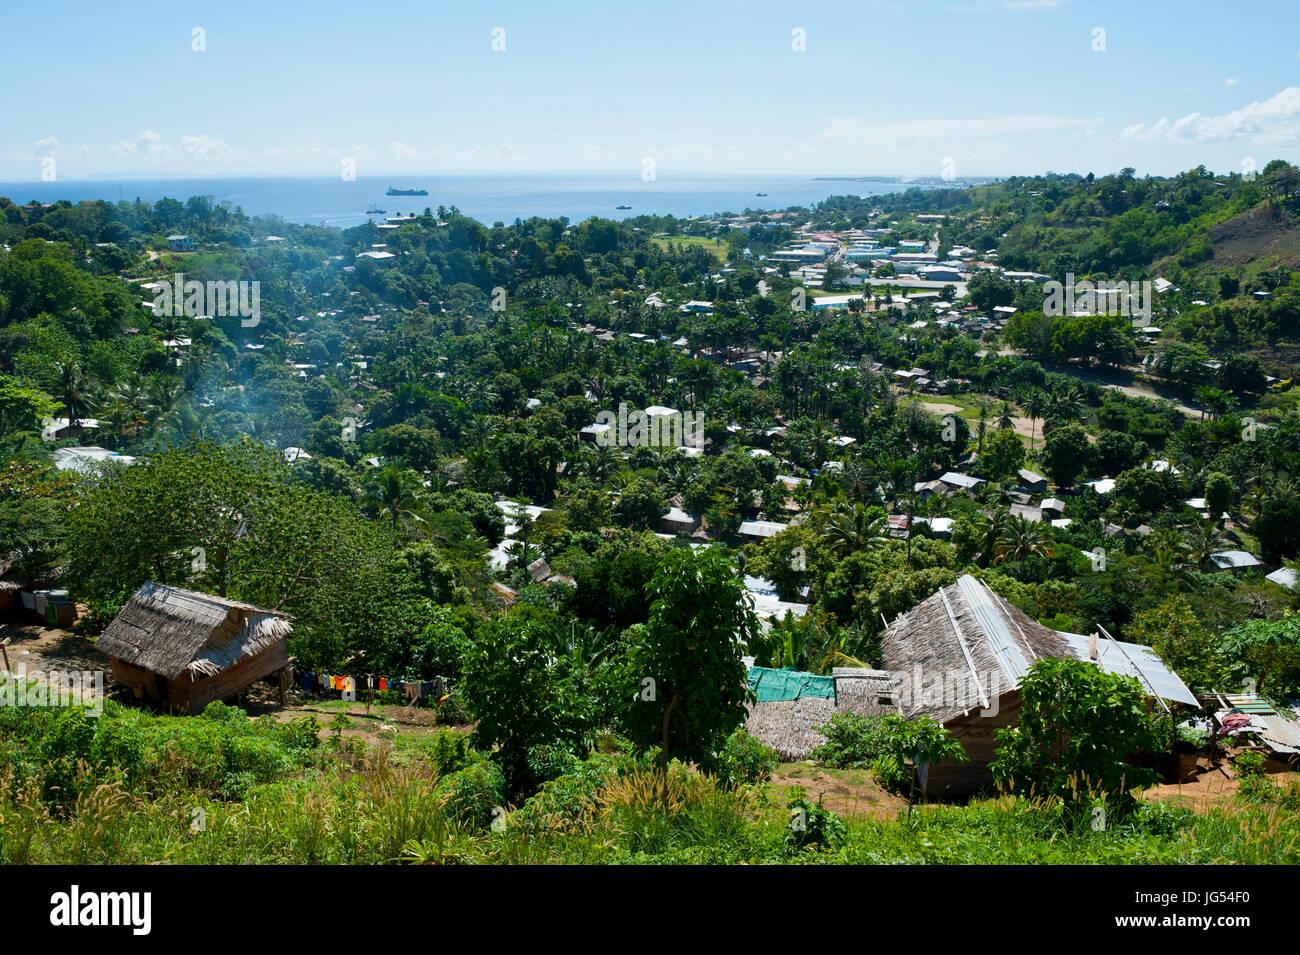 Overlook over Honiara, capital of the Salomon Islands, Pacific - Stock Image